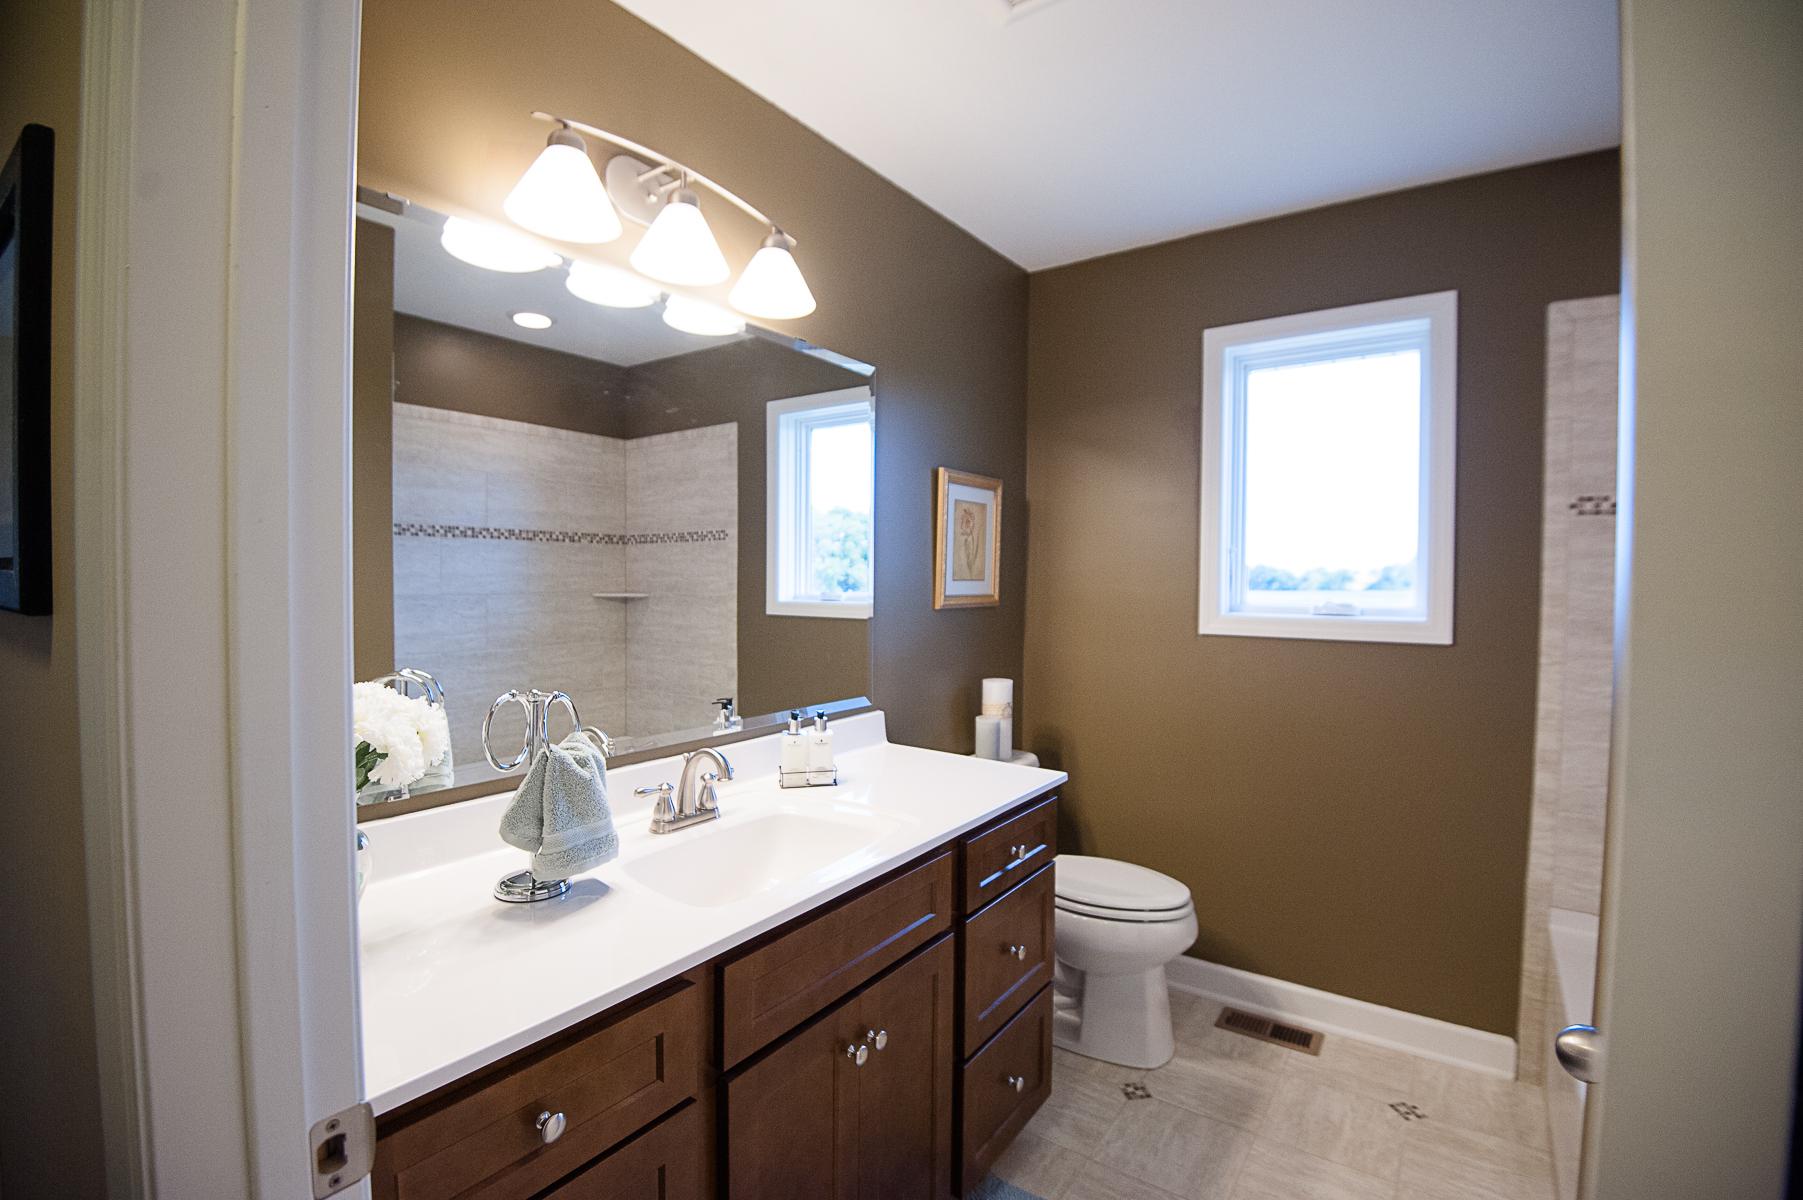 Ramsey house bathroom-4x6-8341.jpg